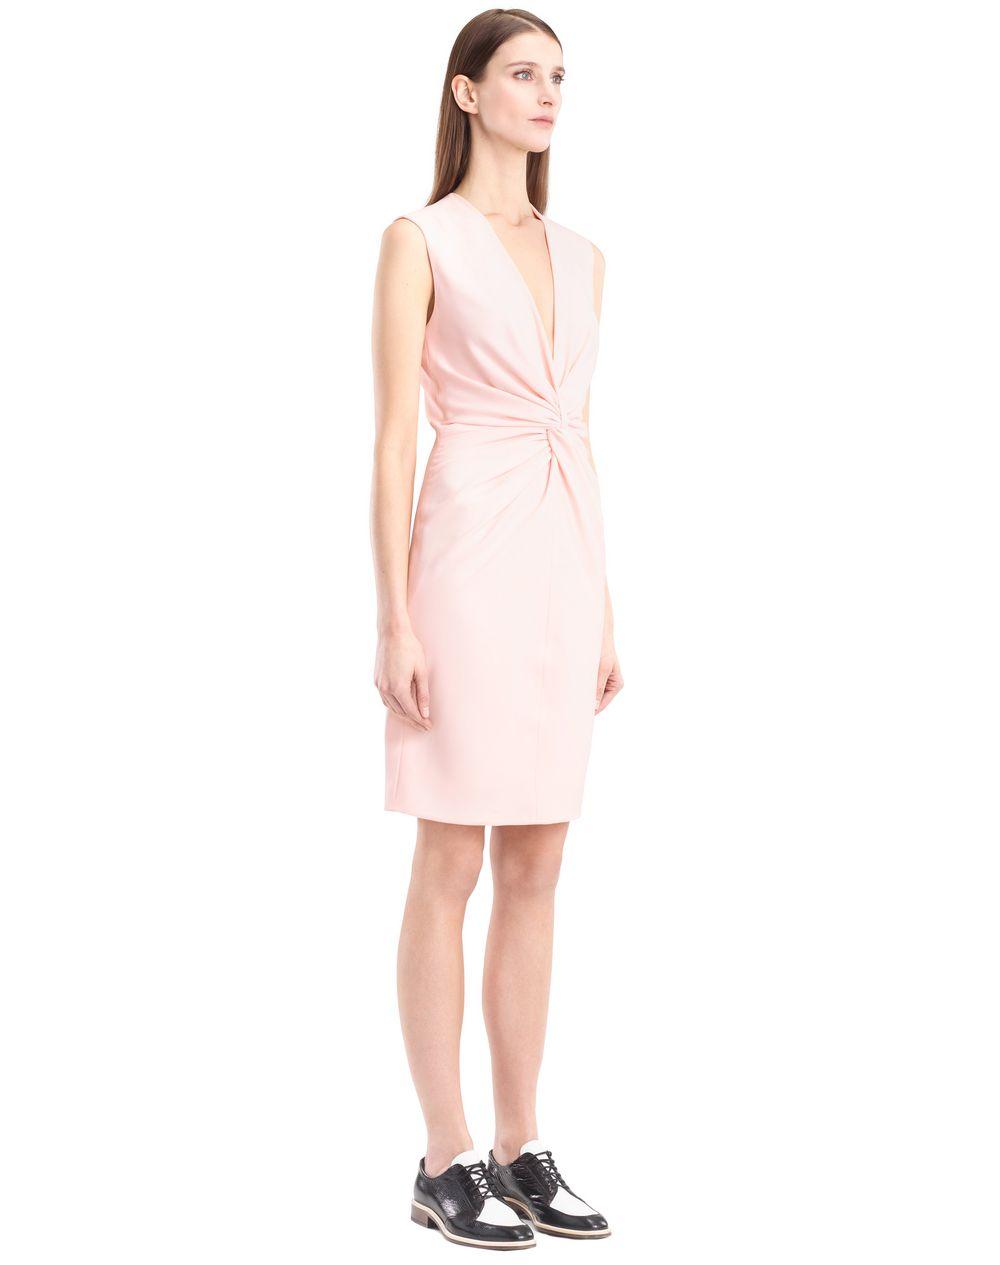 POWDER CADY DRESS - Lanvin